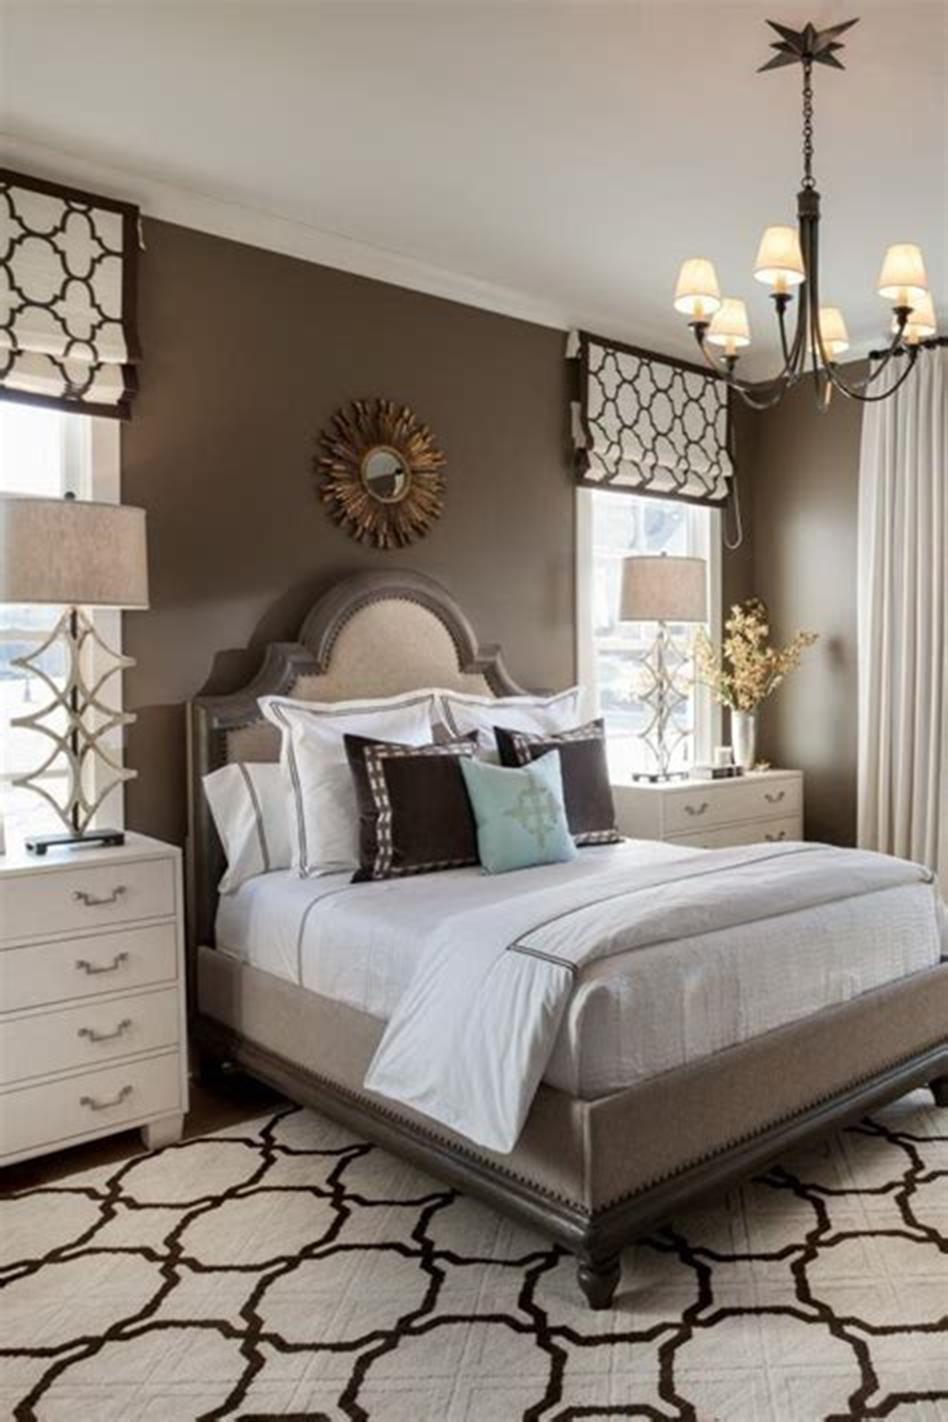 55 Amazing Small Master Bedroom Decorating Design Ideas on ...